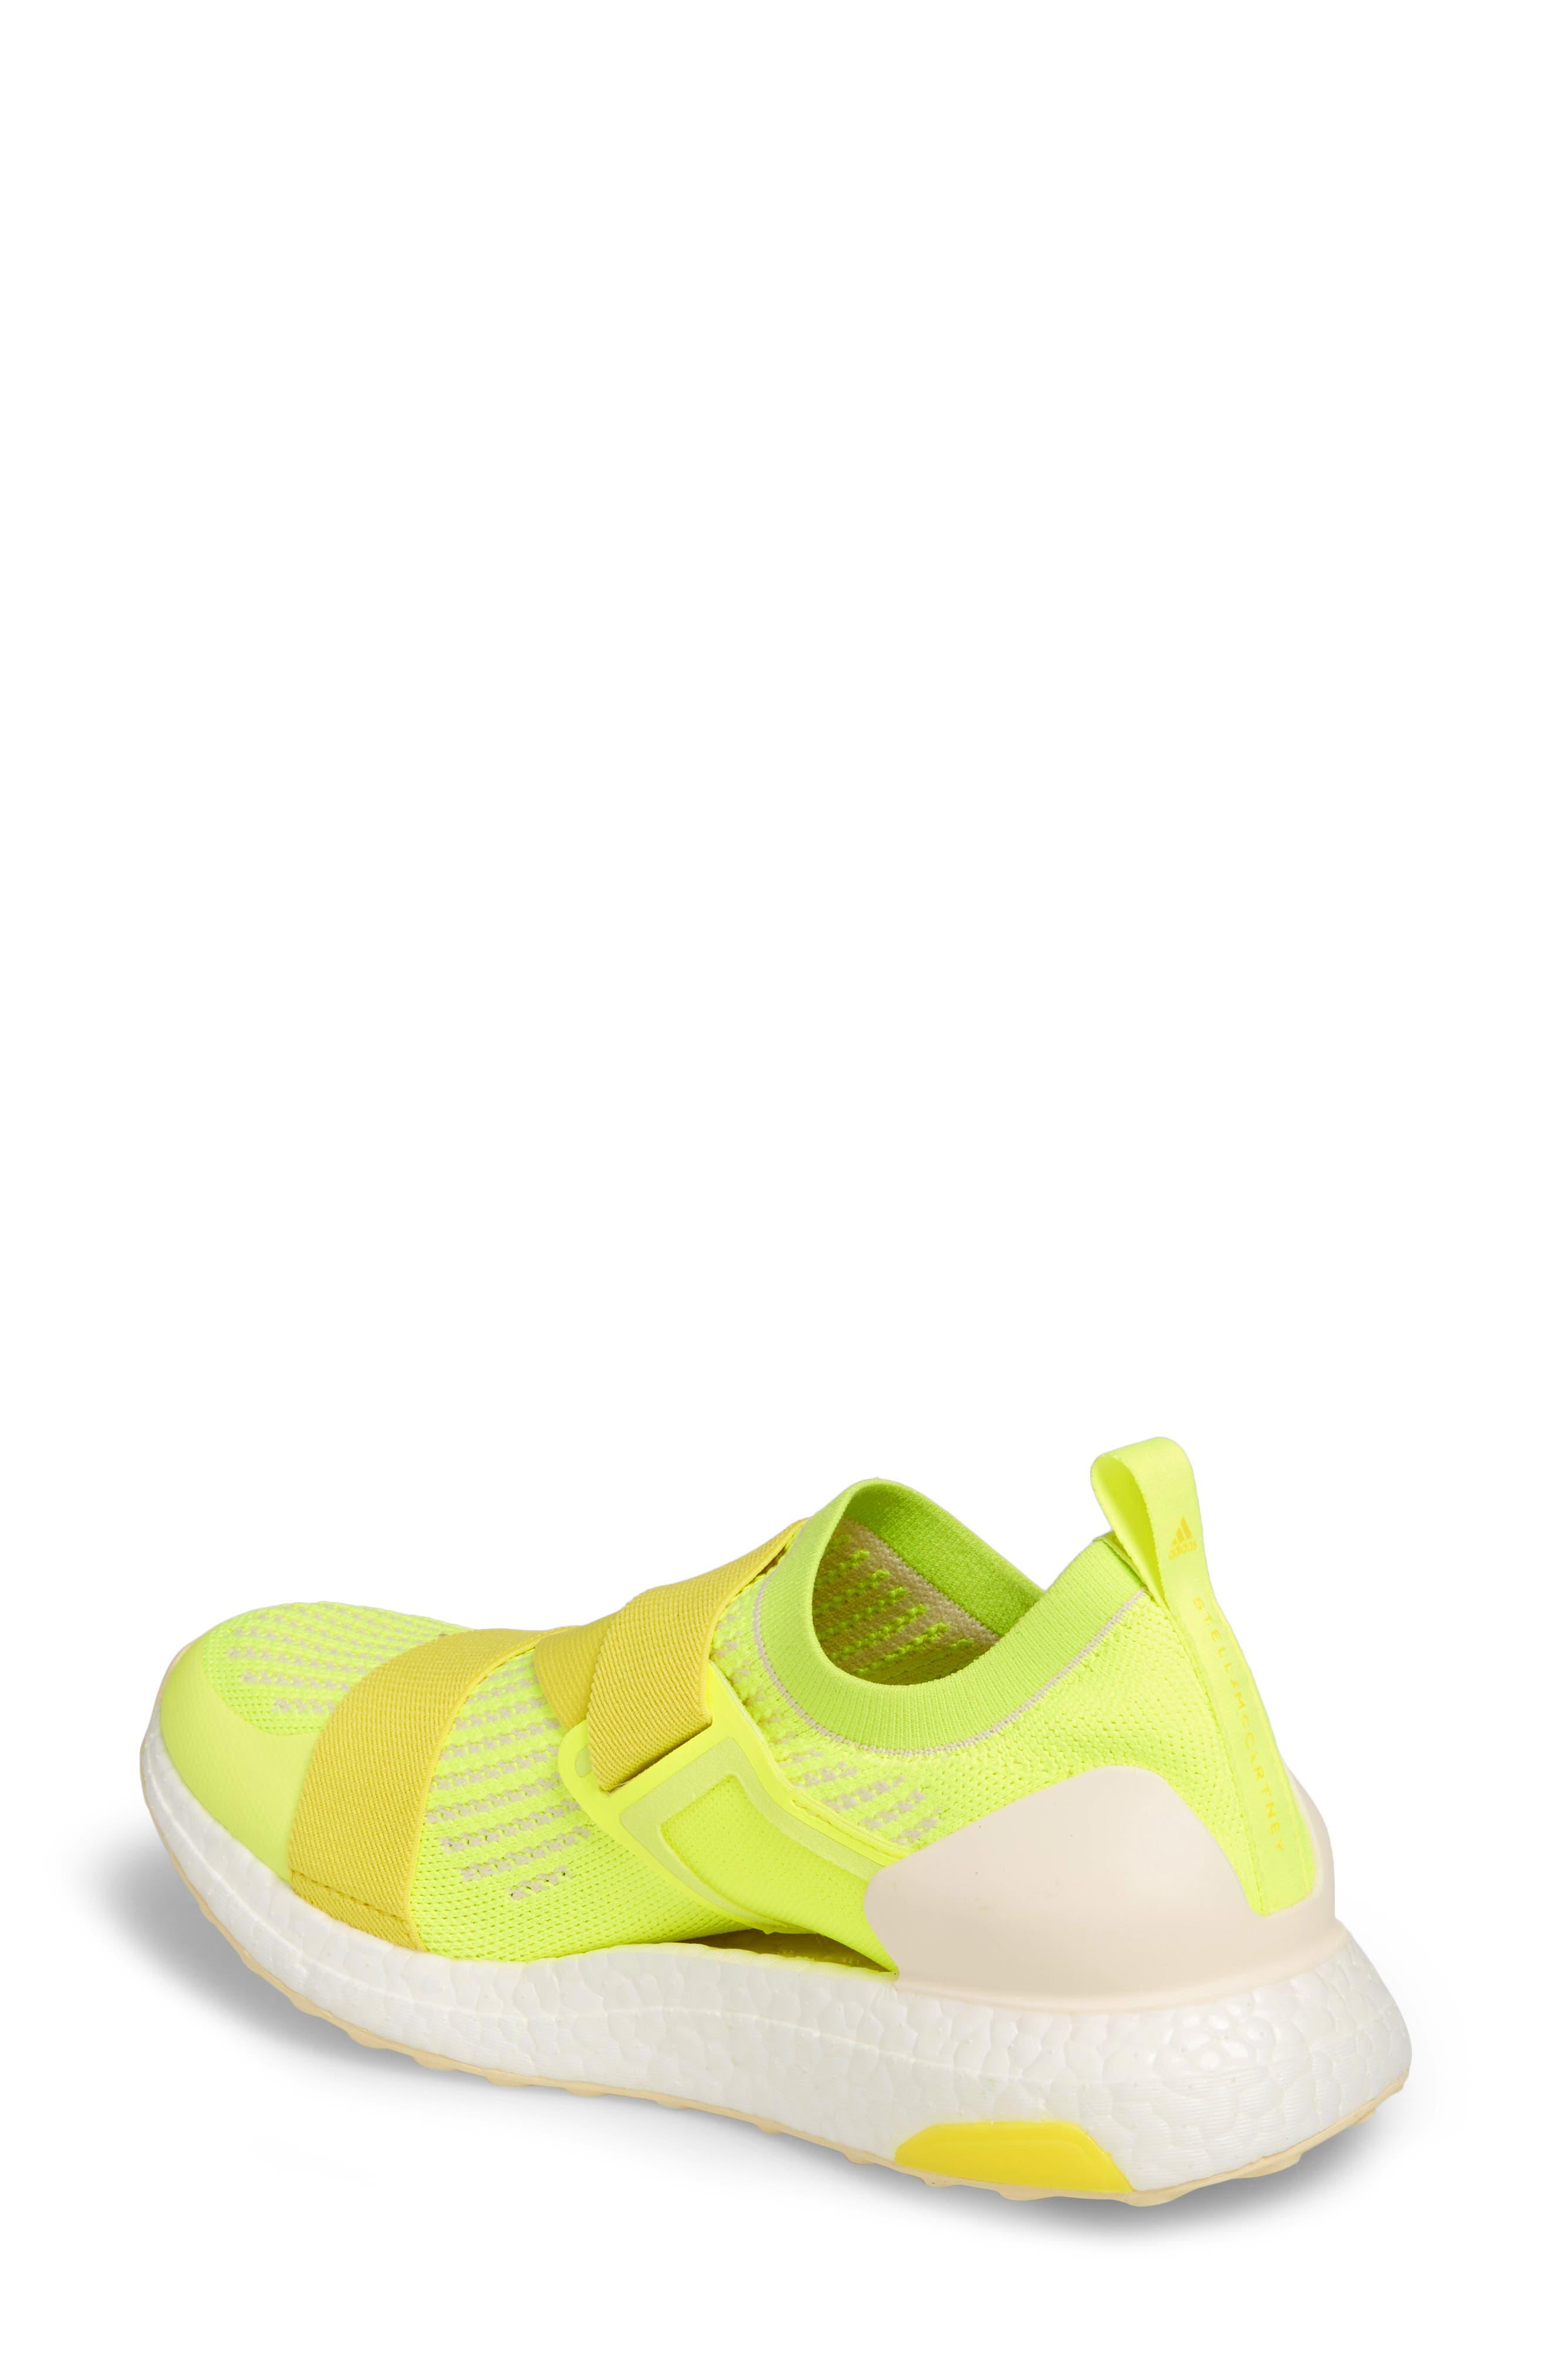 UltraBoost X Running Shoe,                             Alternate thumbnail 2, color,                             SOLAR YELLOW/ YELLOW/ SUN